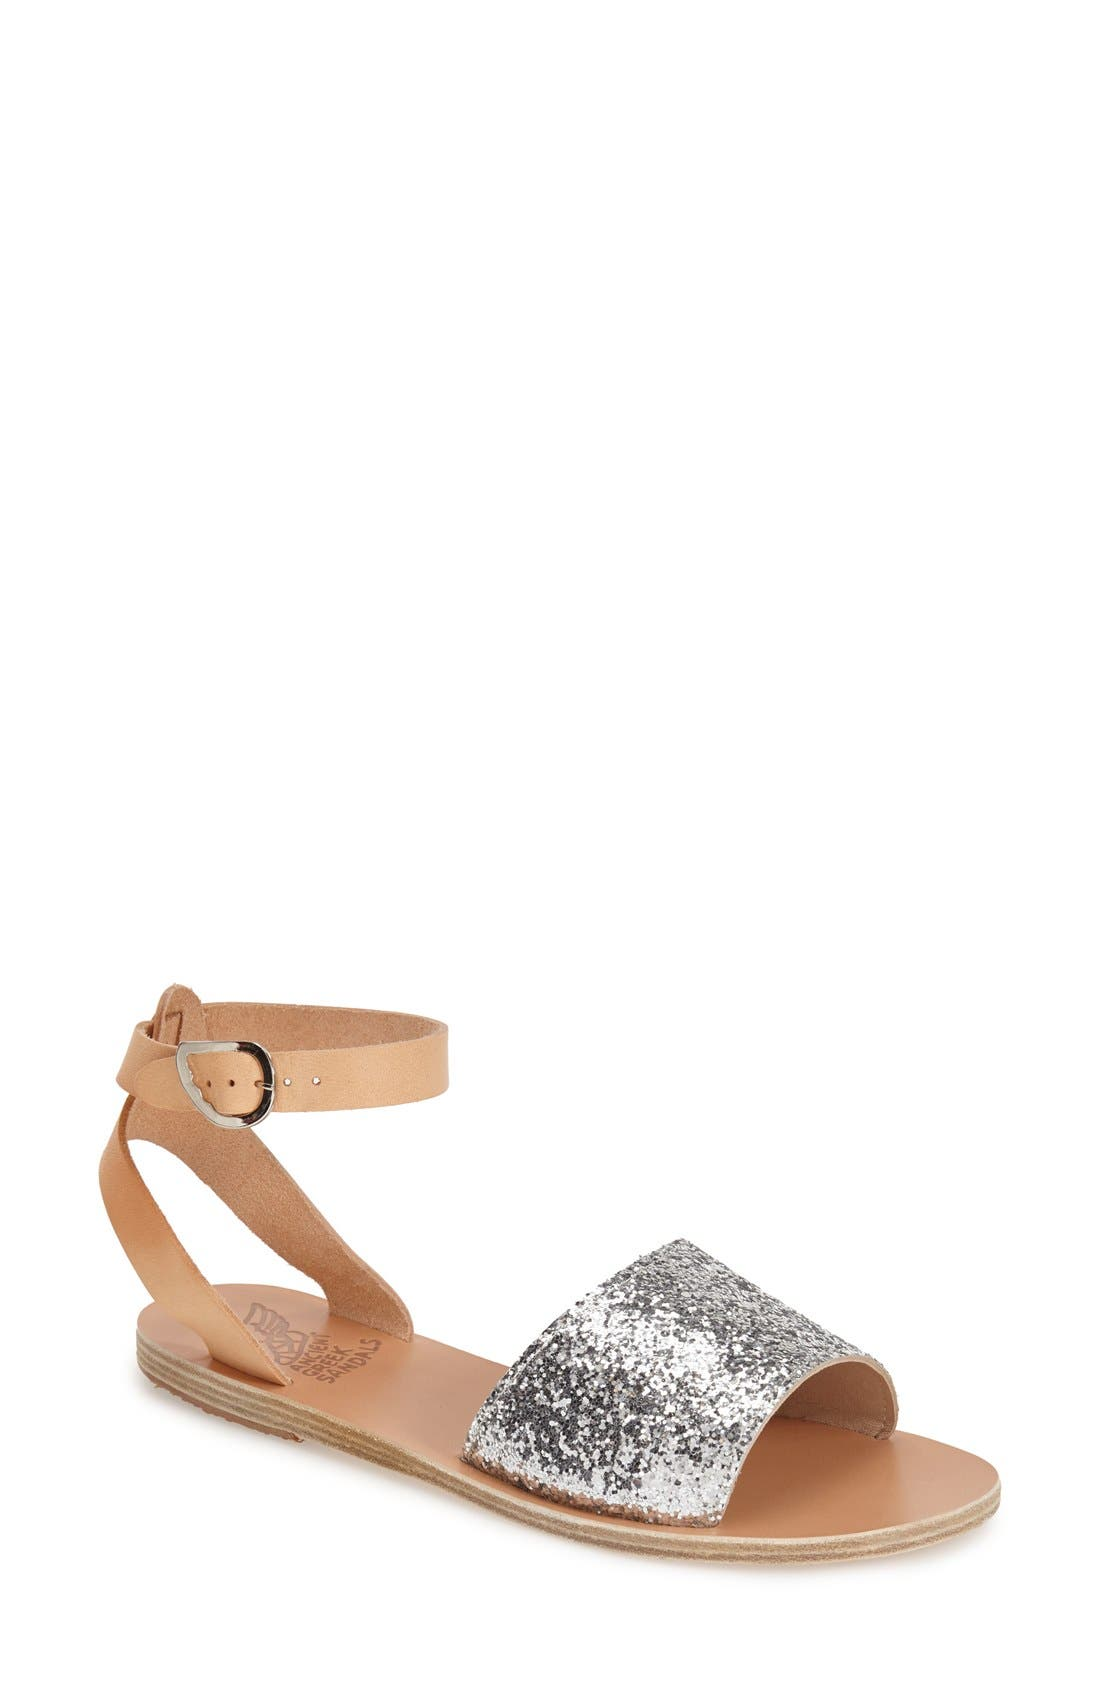 Alternate Image 1 Selected - Ancient Greek Sandals 'Thalpori' Leather Ankle Strap Sandal (Women)